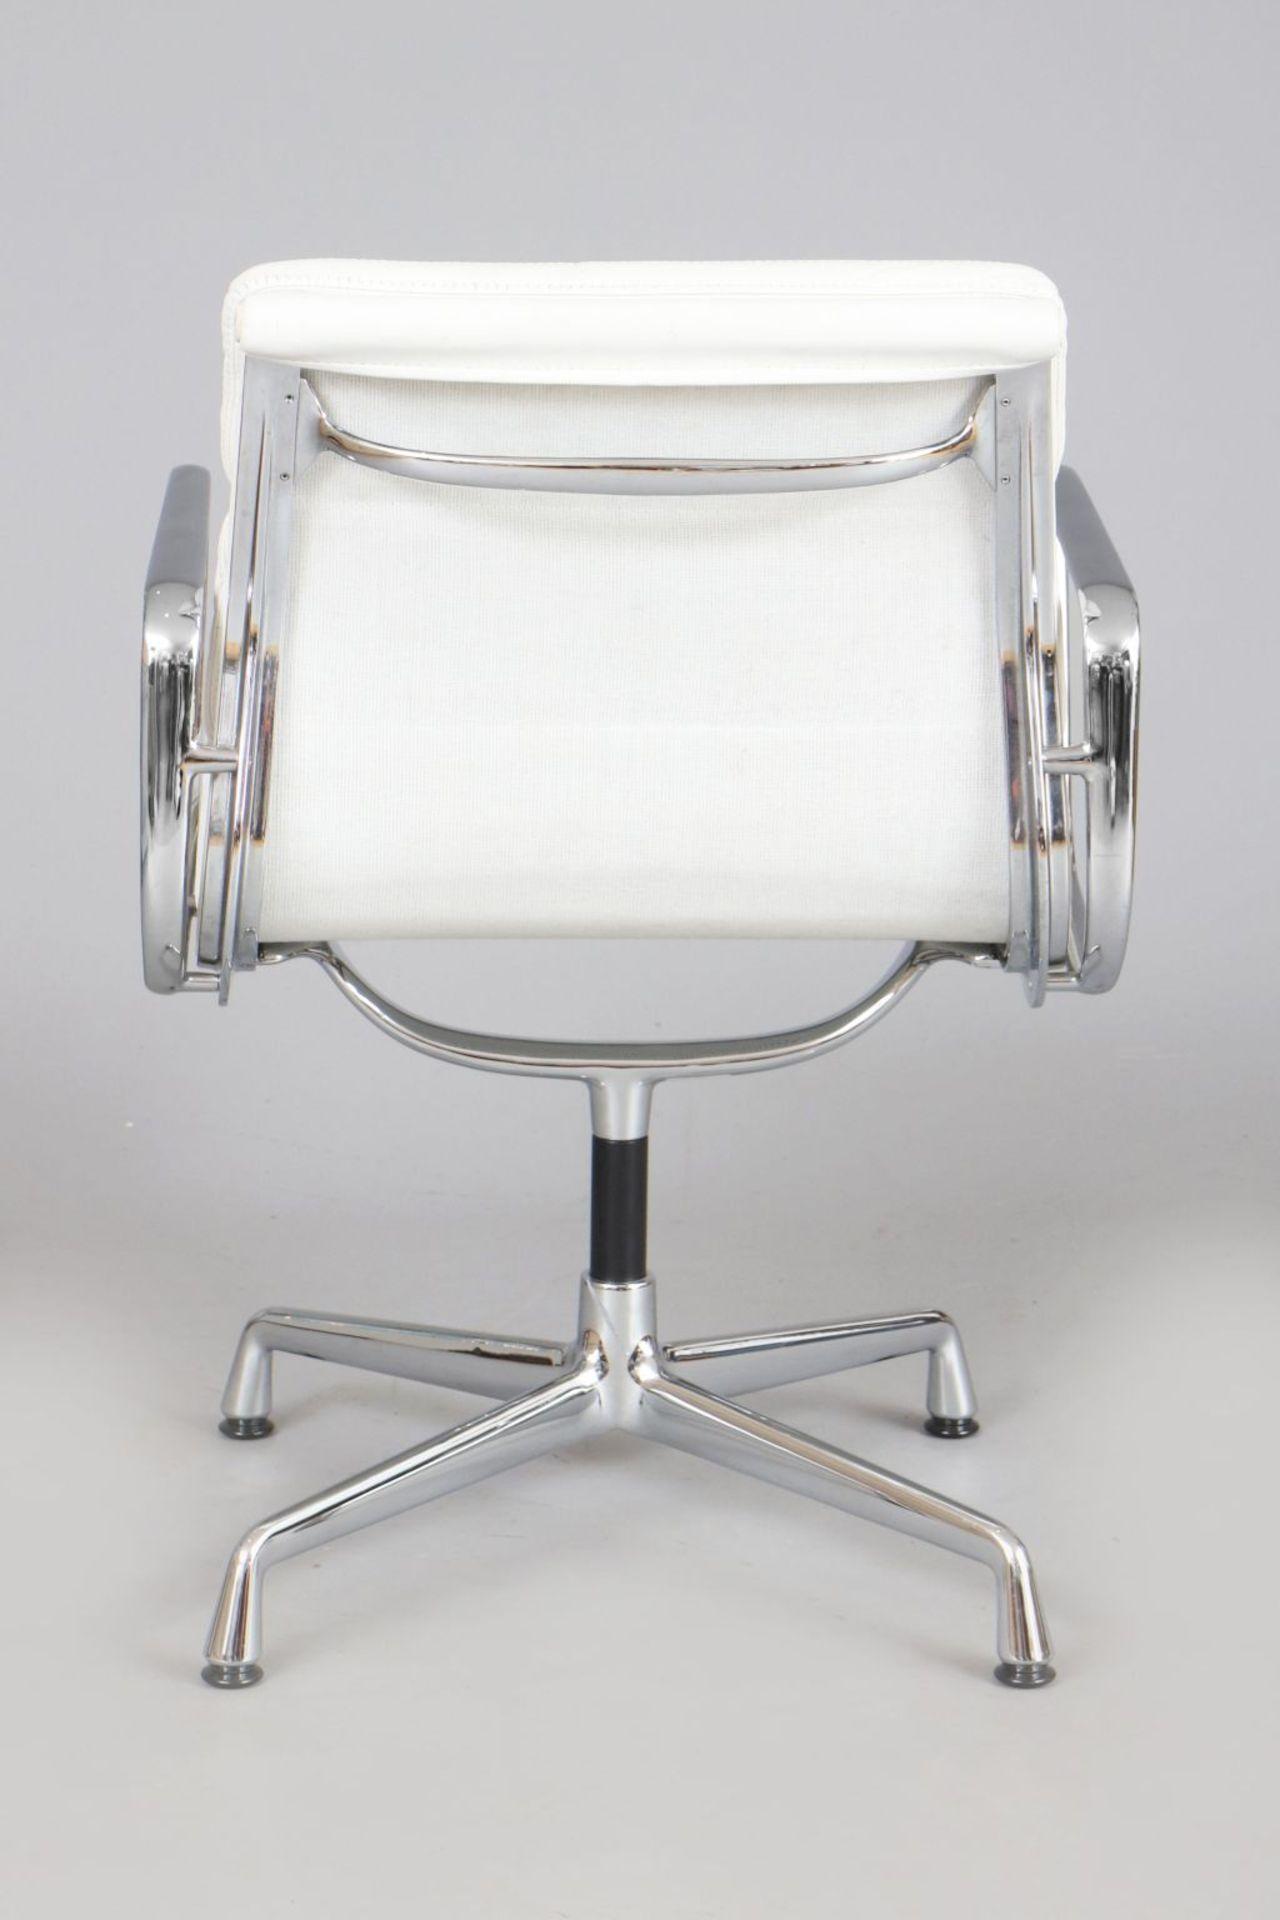 CHARLES & RAY EAMES Aluminium Chair - Soft Pad - EA 208 - Image 2 of 3